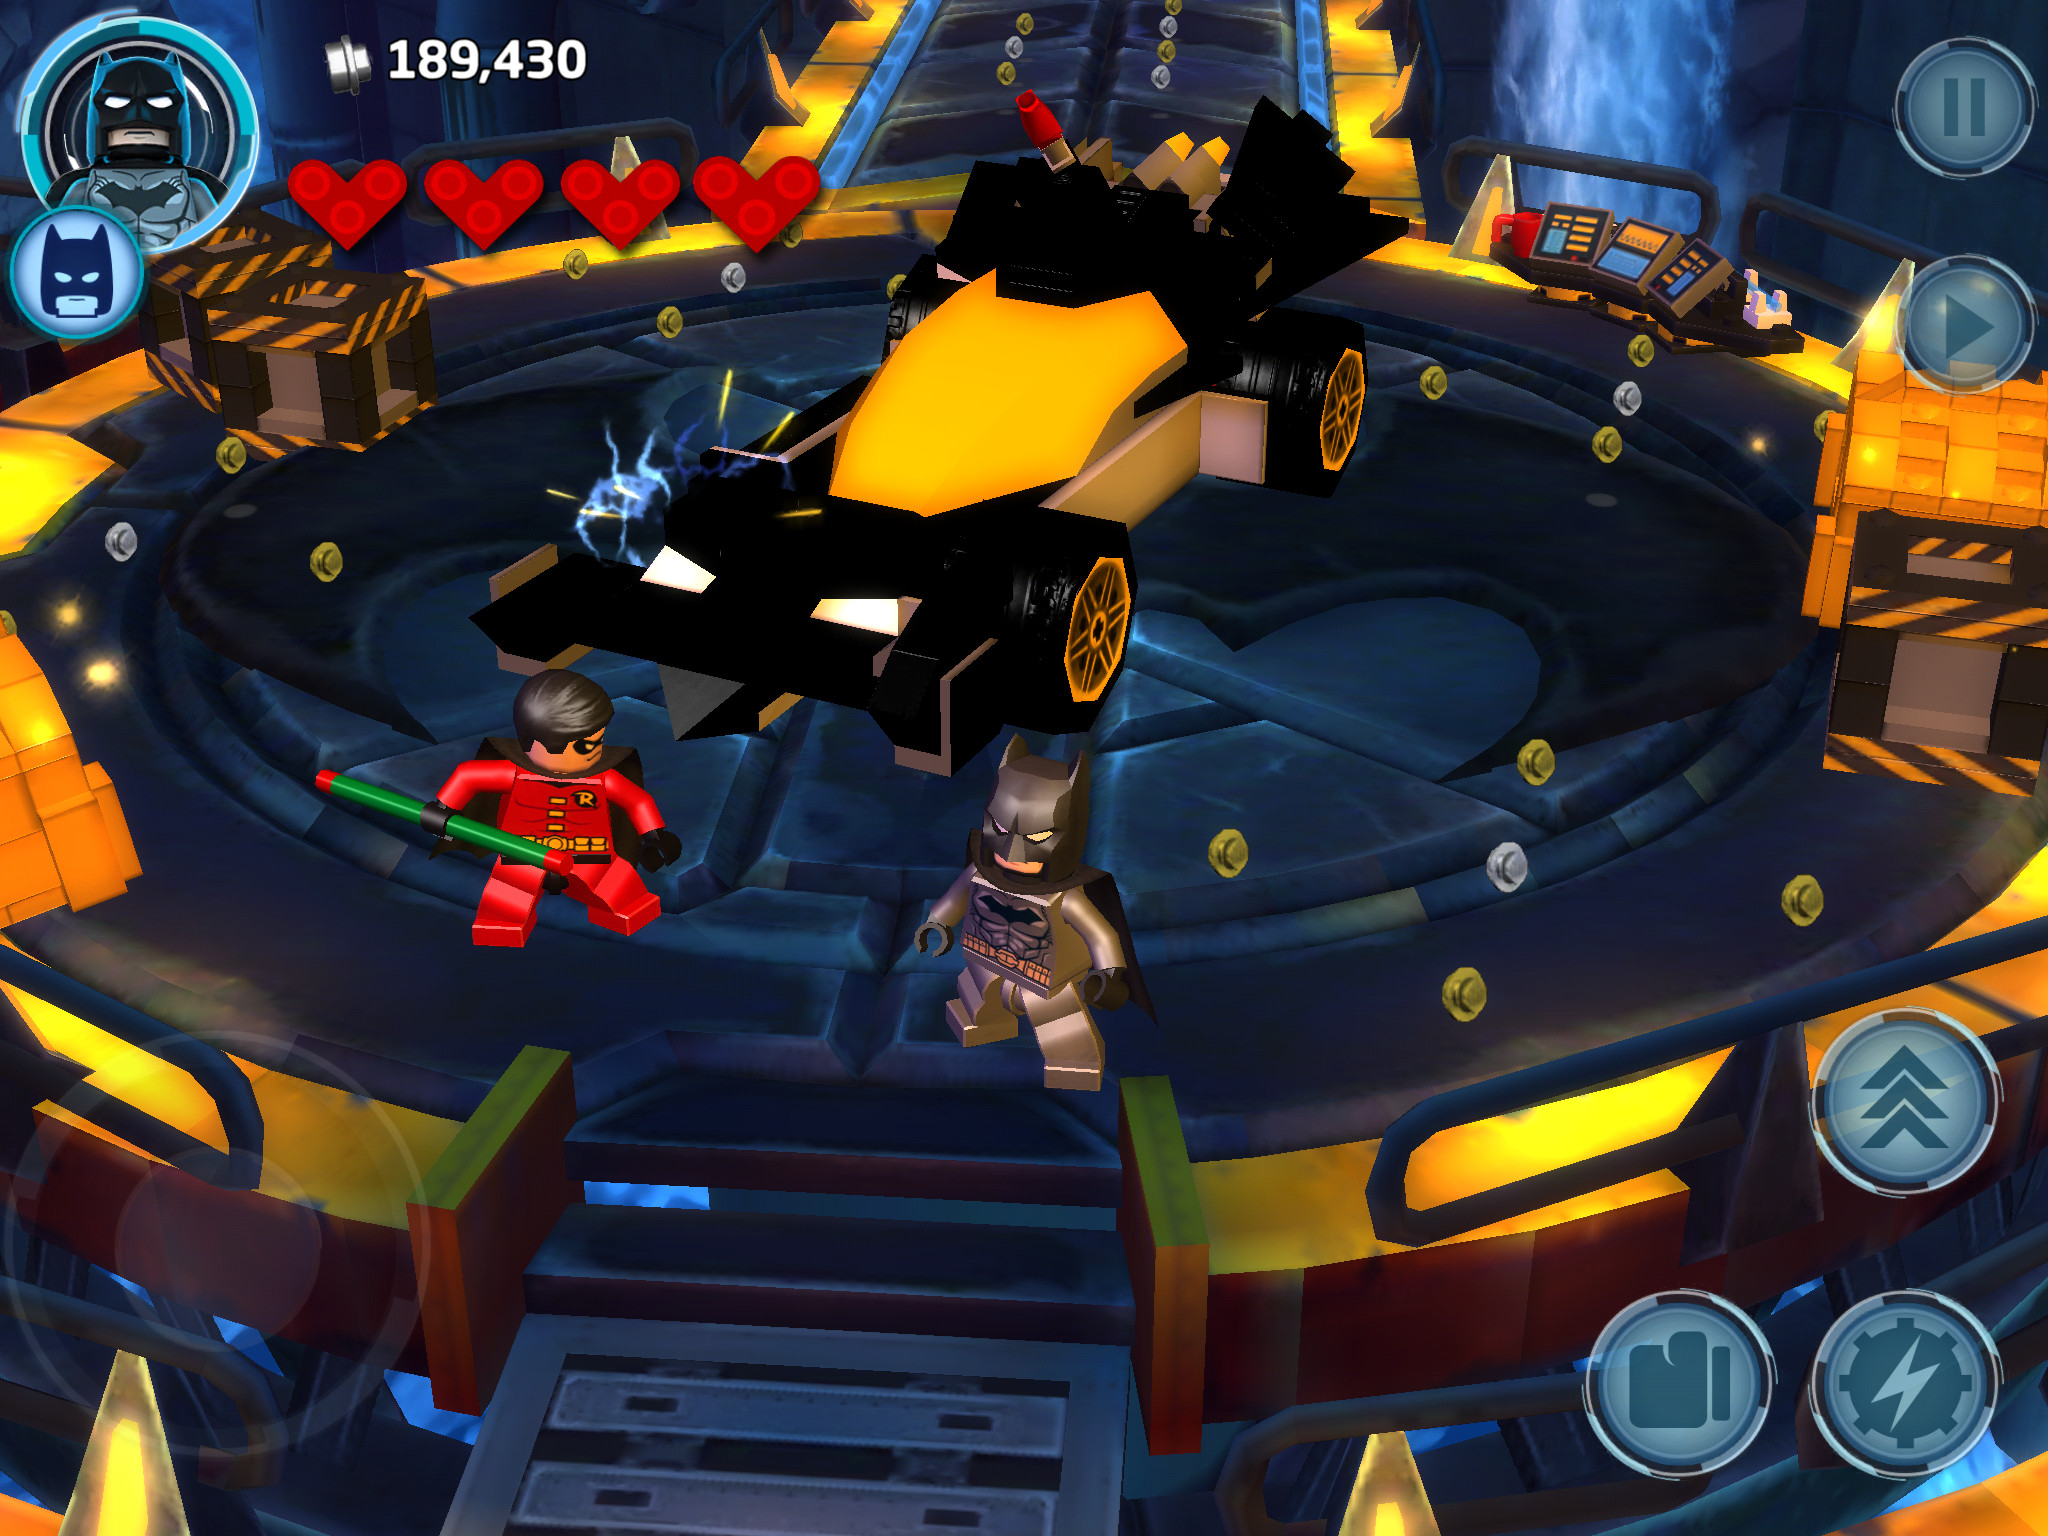 Lego Batman: Beyond Gotham - Holy repetition Batman | Articles | Pocket  Gamer